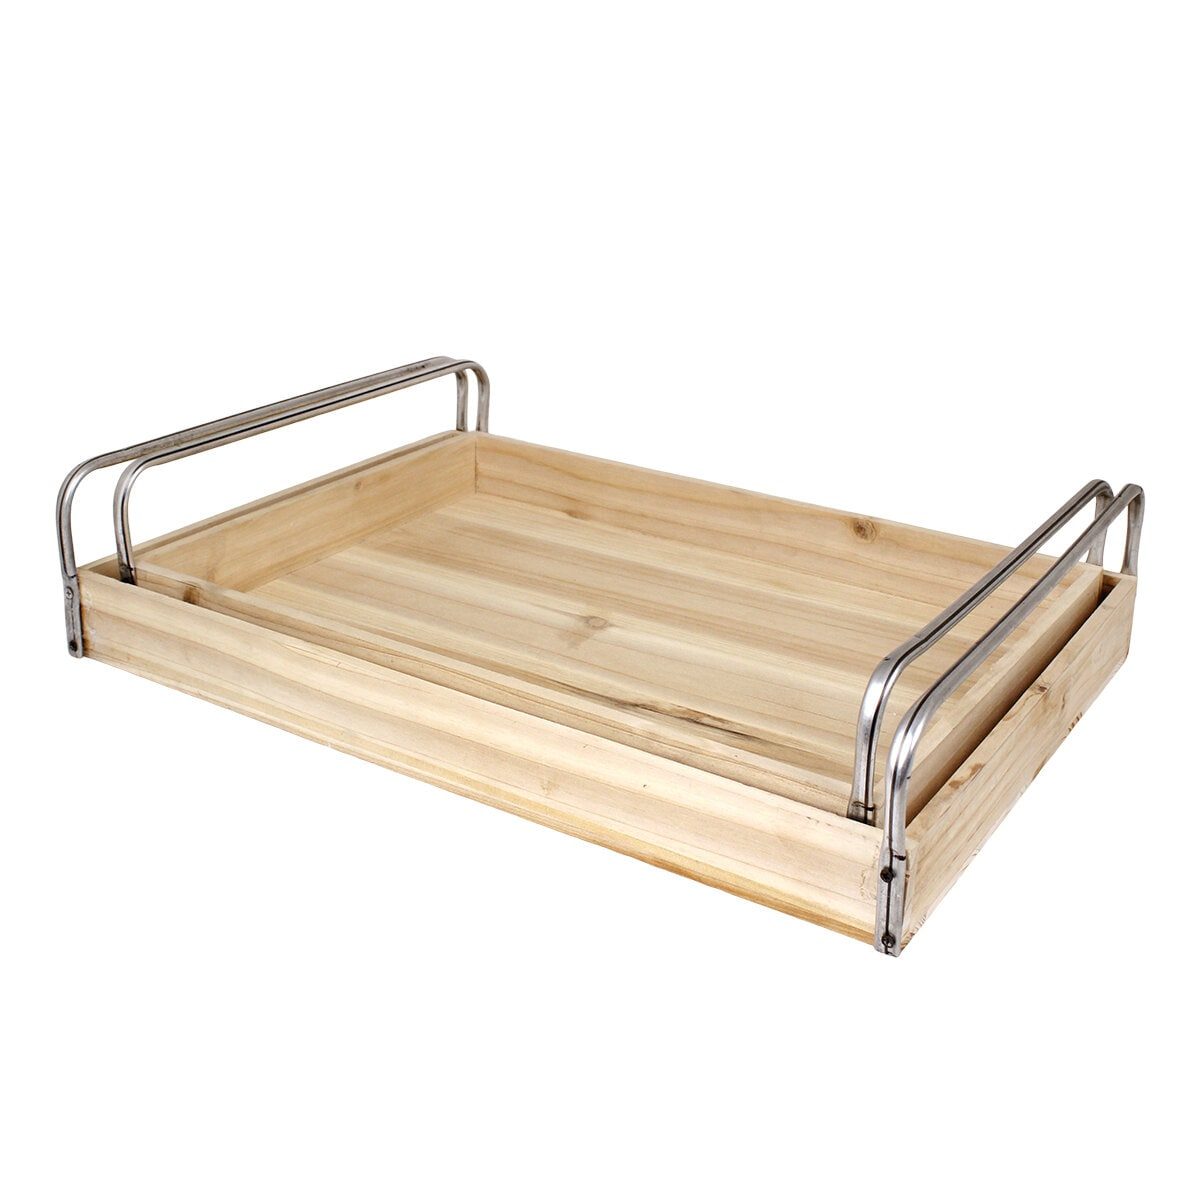 Wooden Tray Arne w. Metal Handle S/2